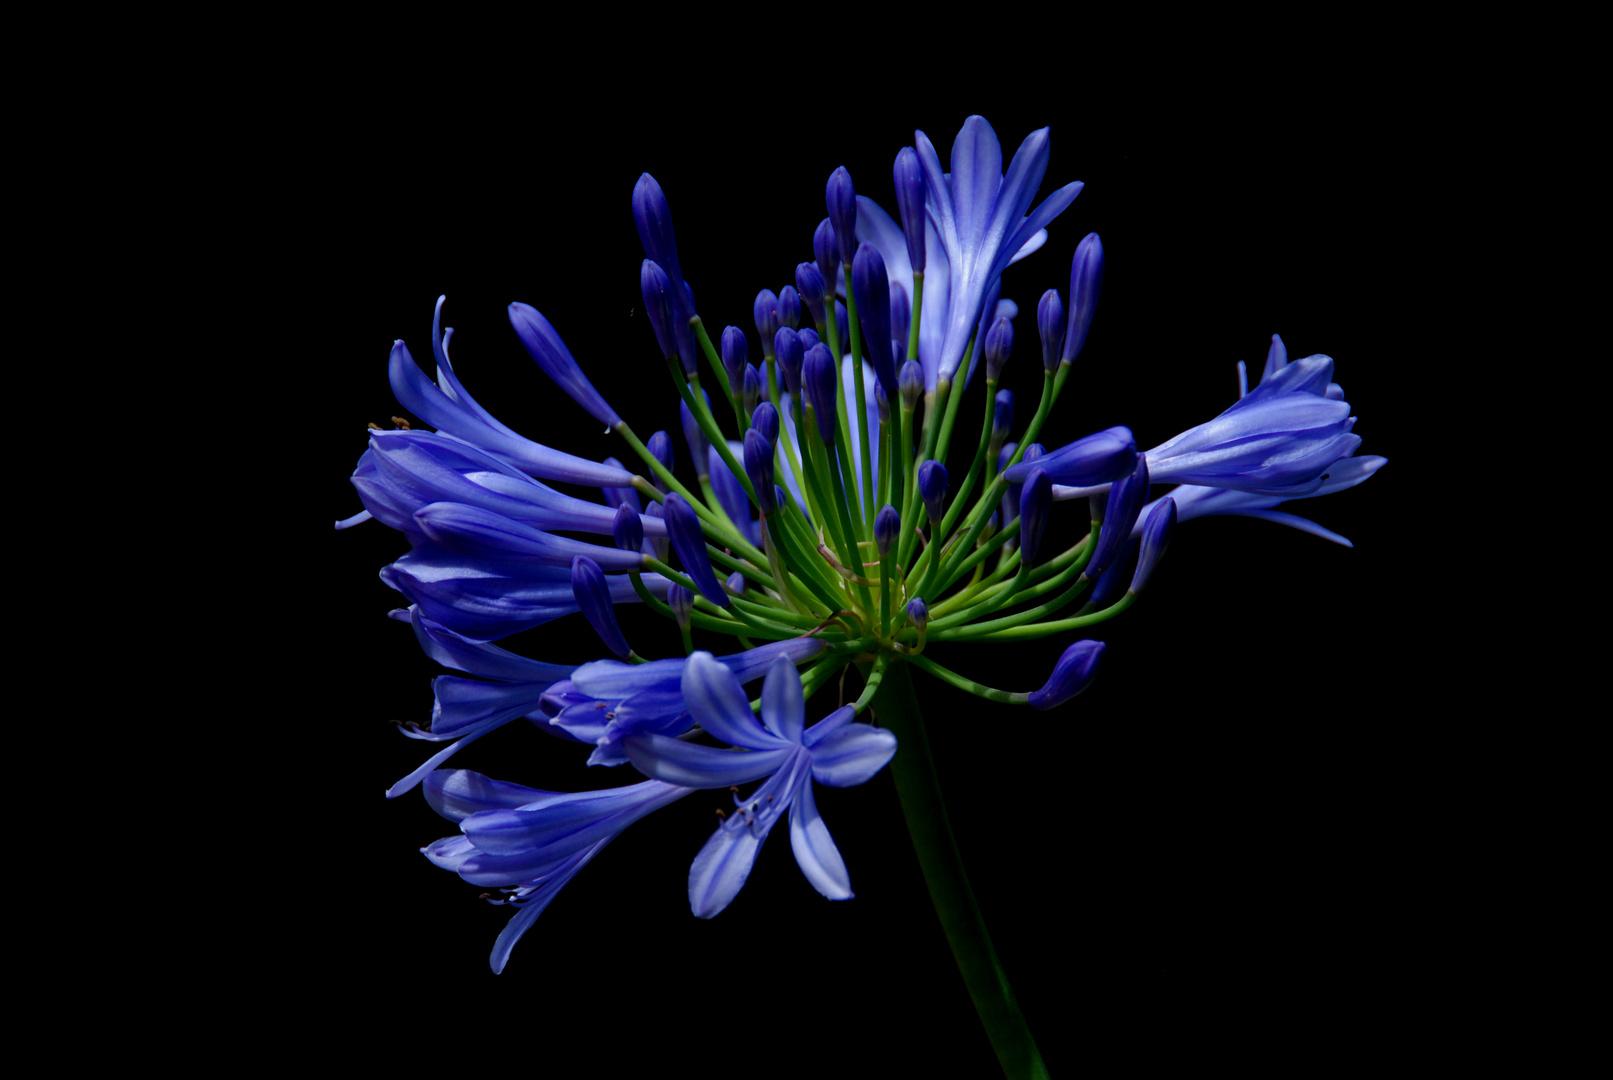 Blaue Erscheinung